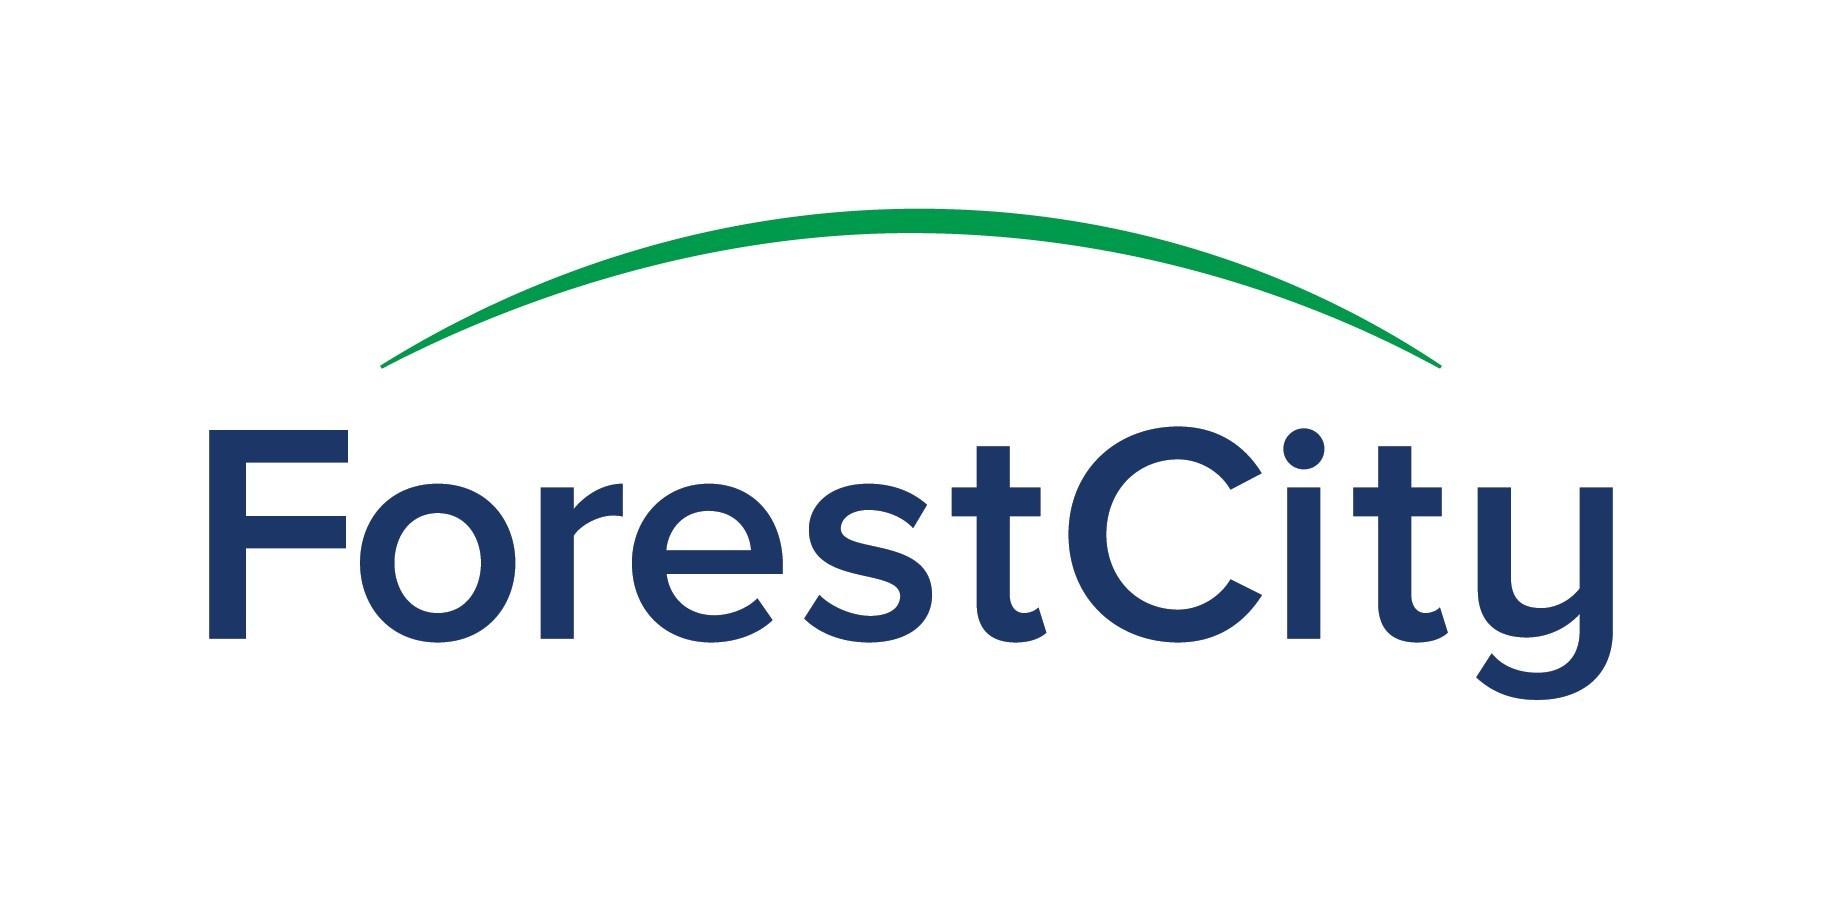 Forest City logo (PRNewsfoto/Forest City Realty Trust, Inc.)